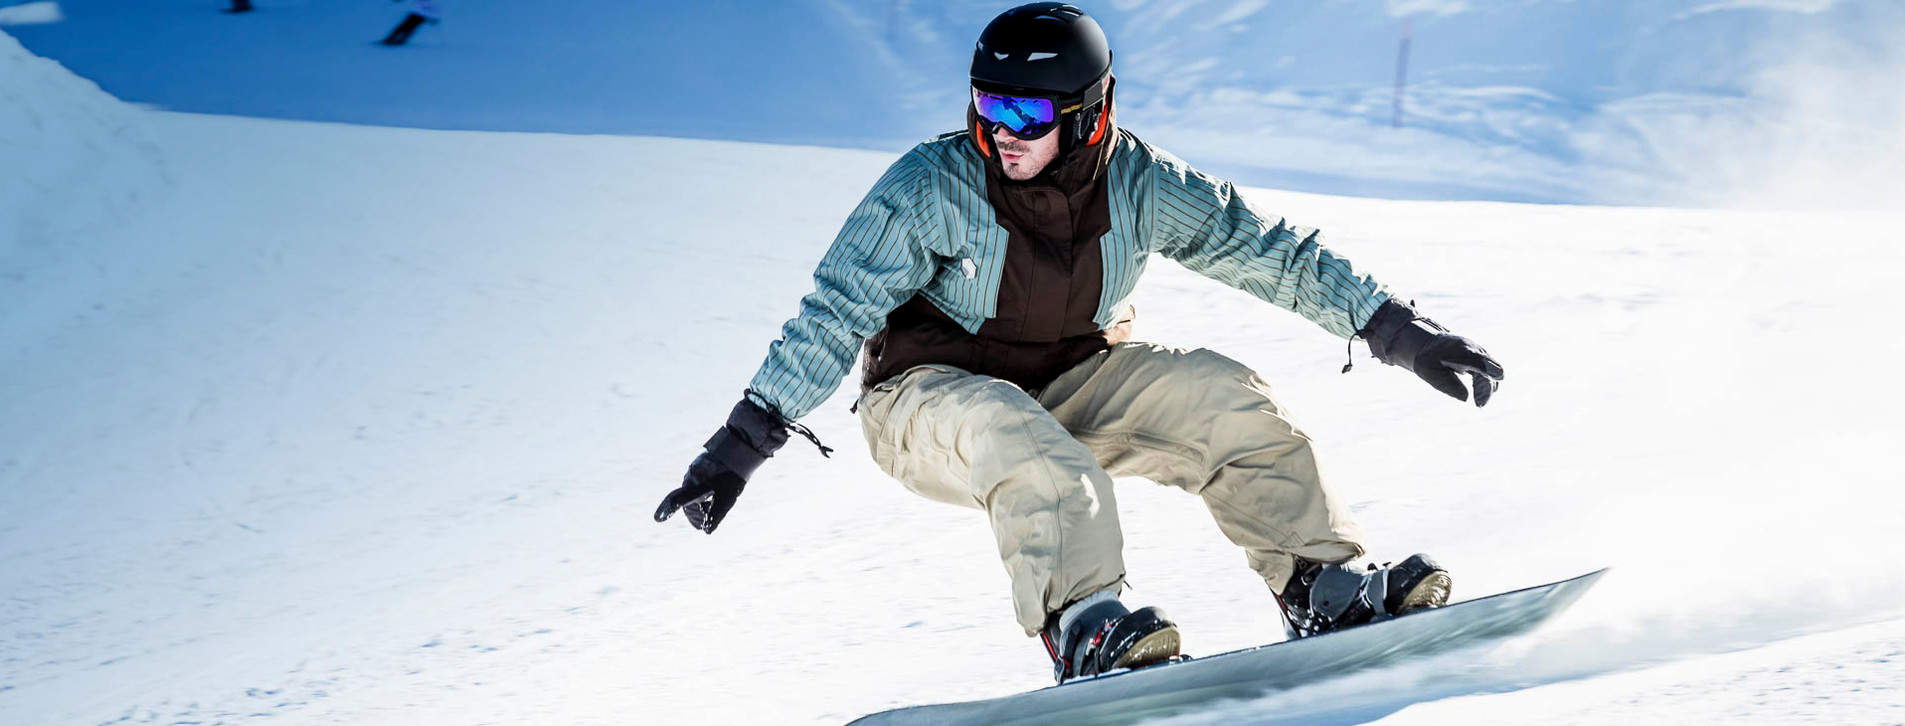 Фото - Мастер-класс катания на лыжах/сноуборде